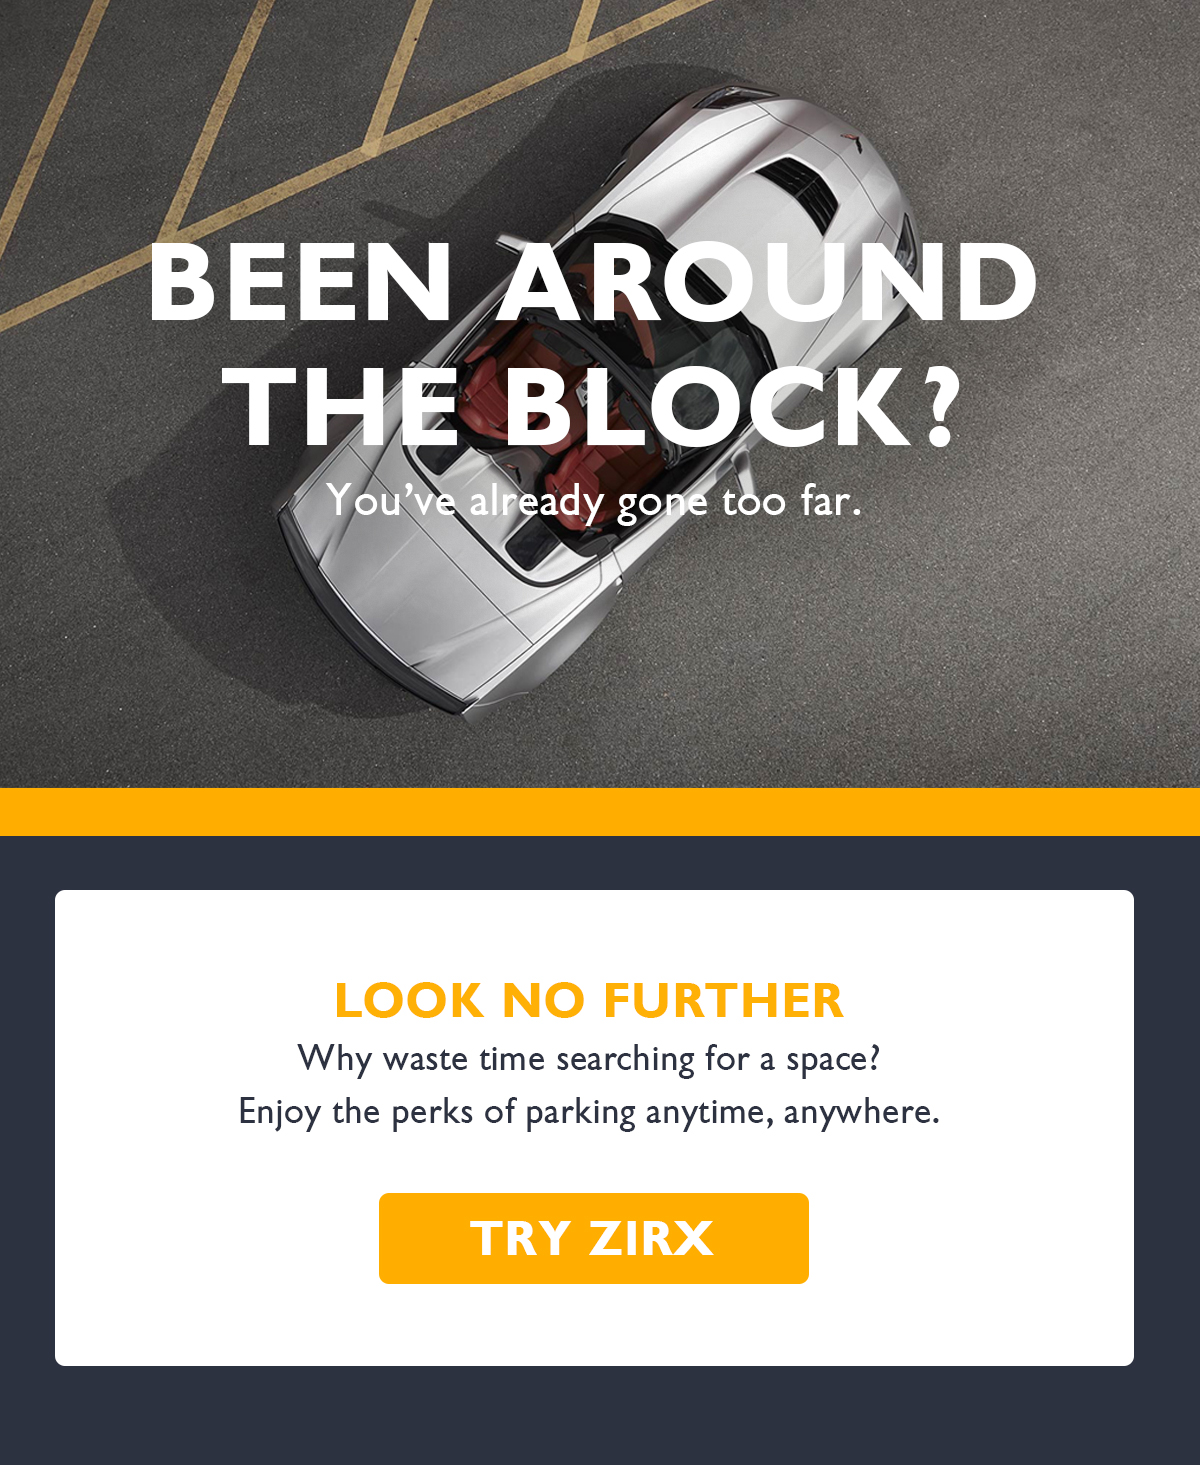 E-mail for Zirx